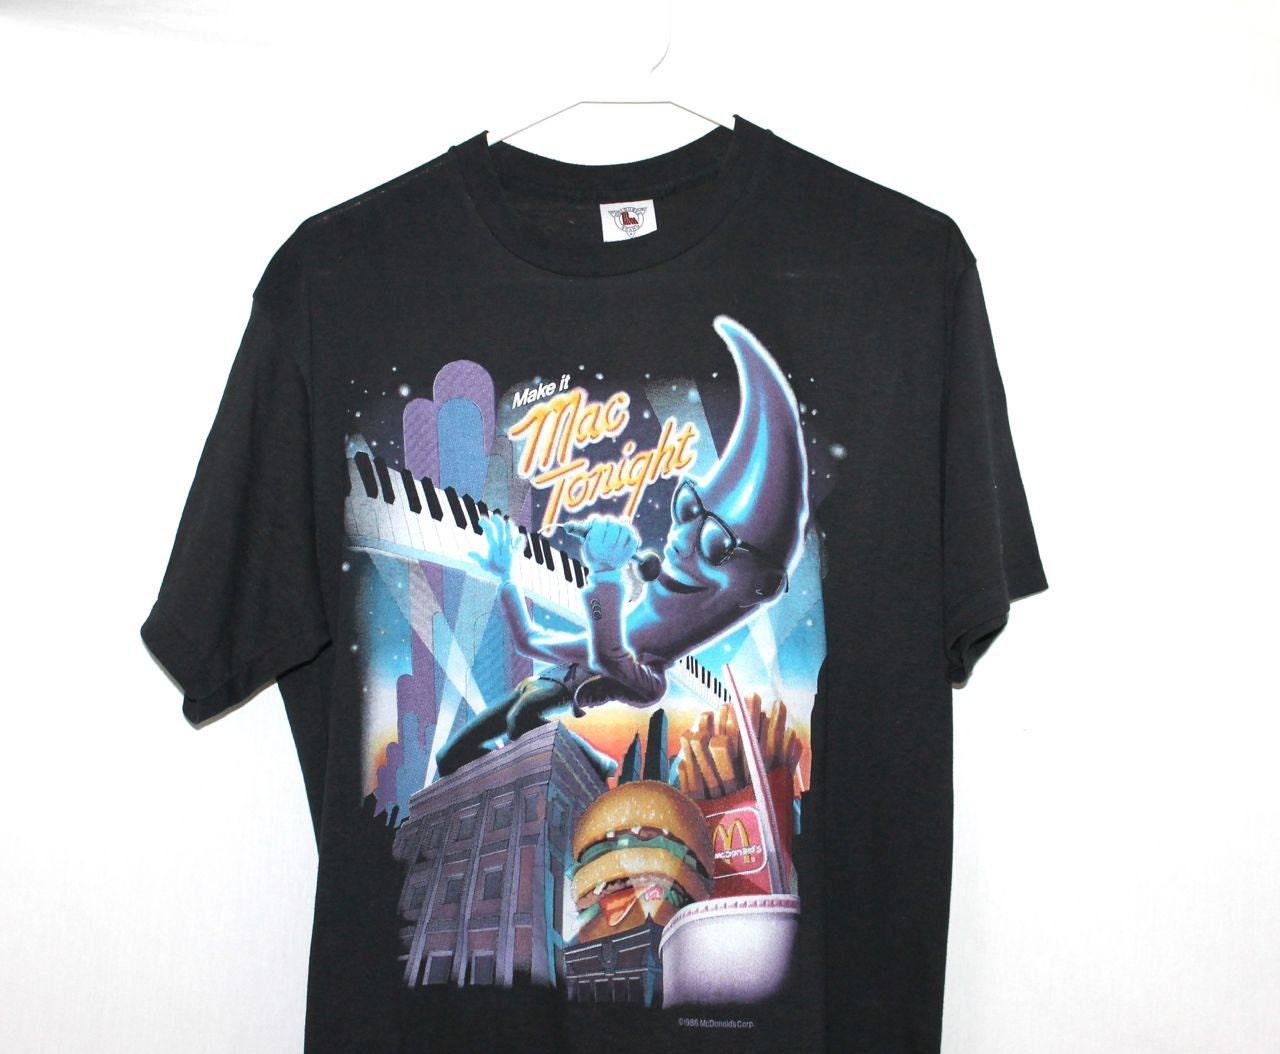 Design t shirt on mac -  Mac Tonight Mcdonalds T Shirt Zoom